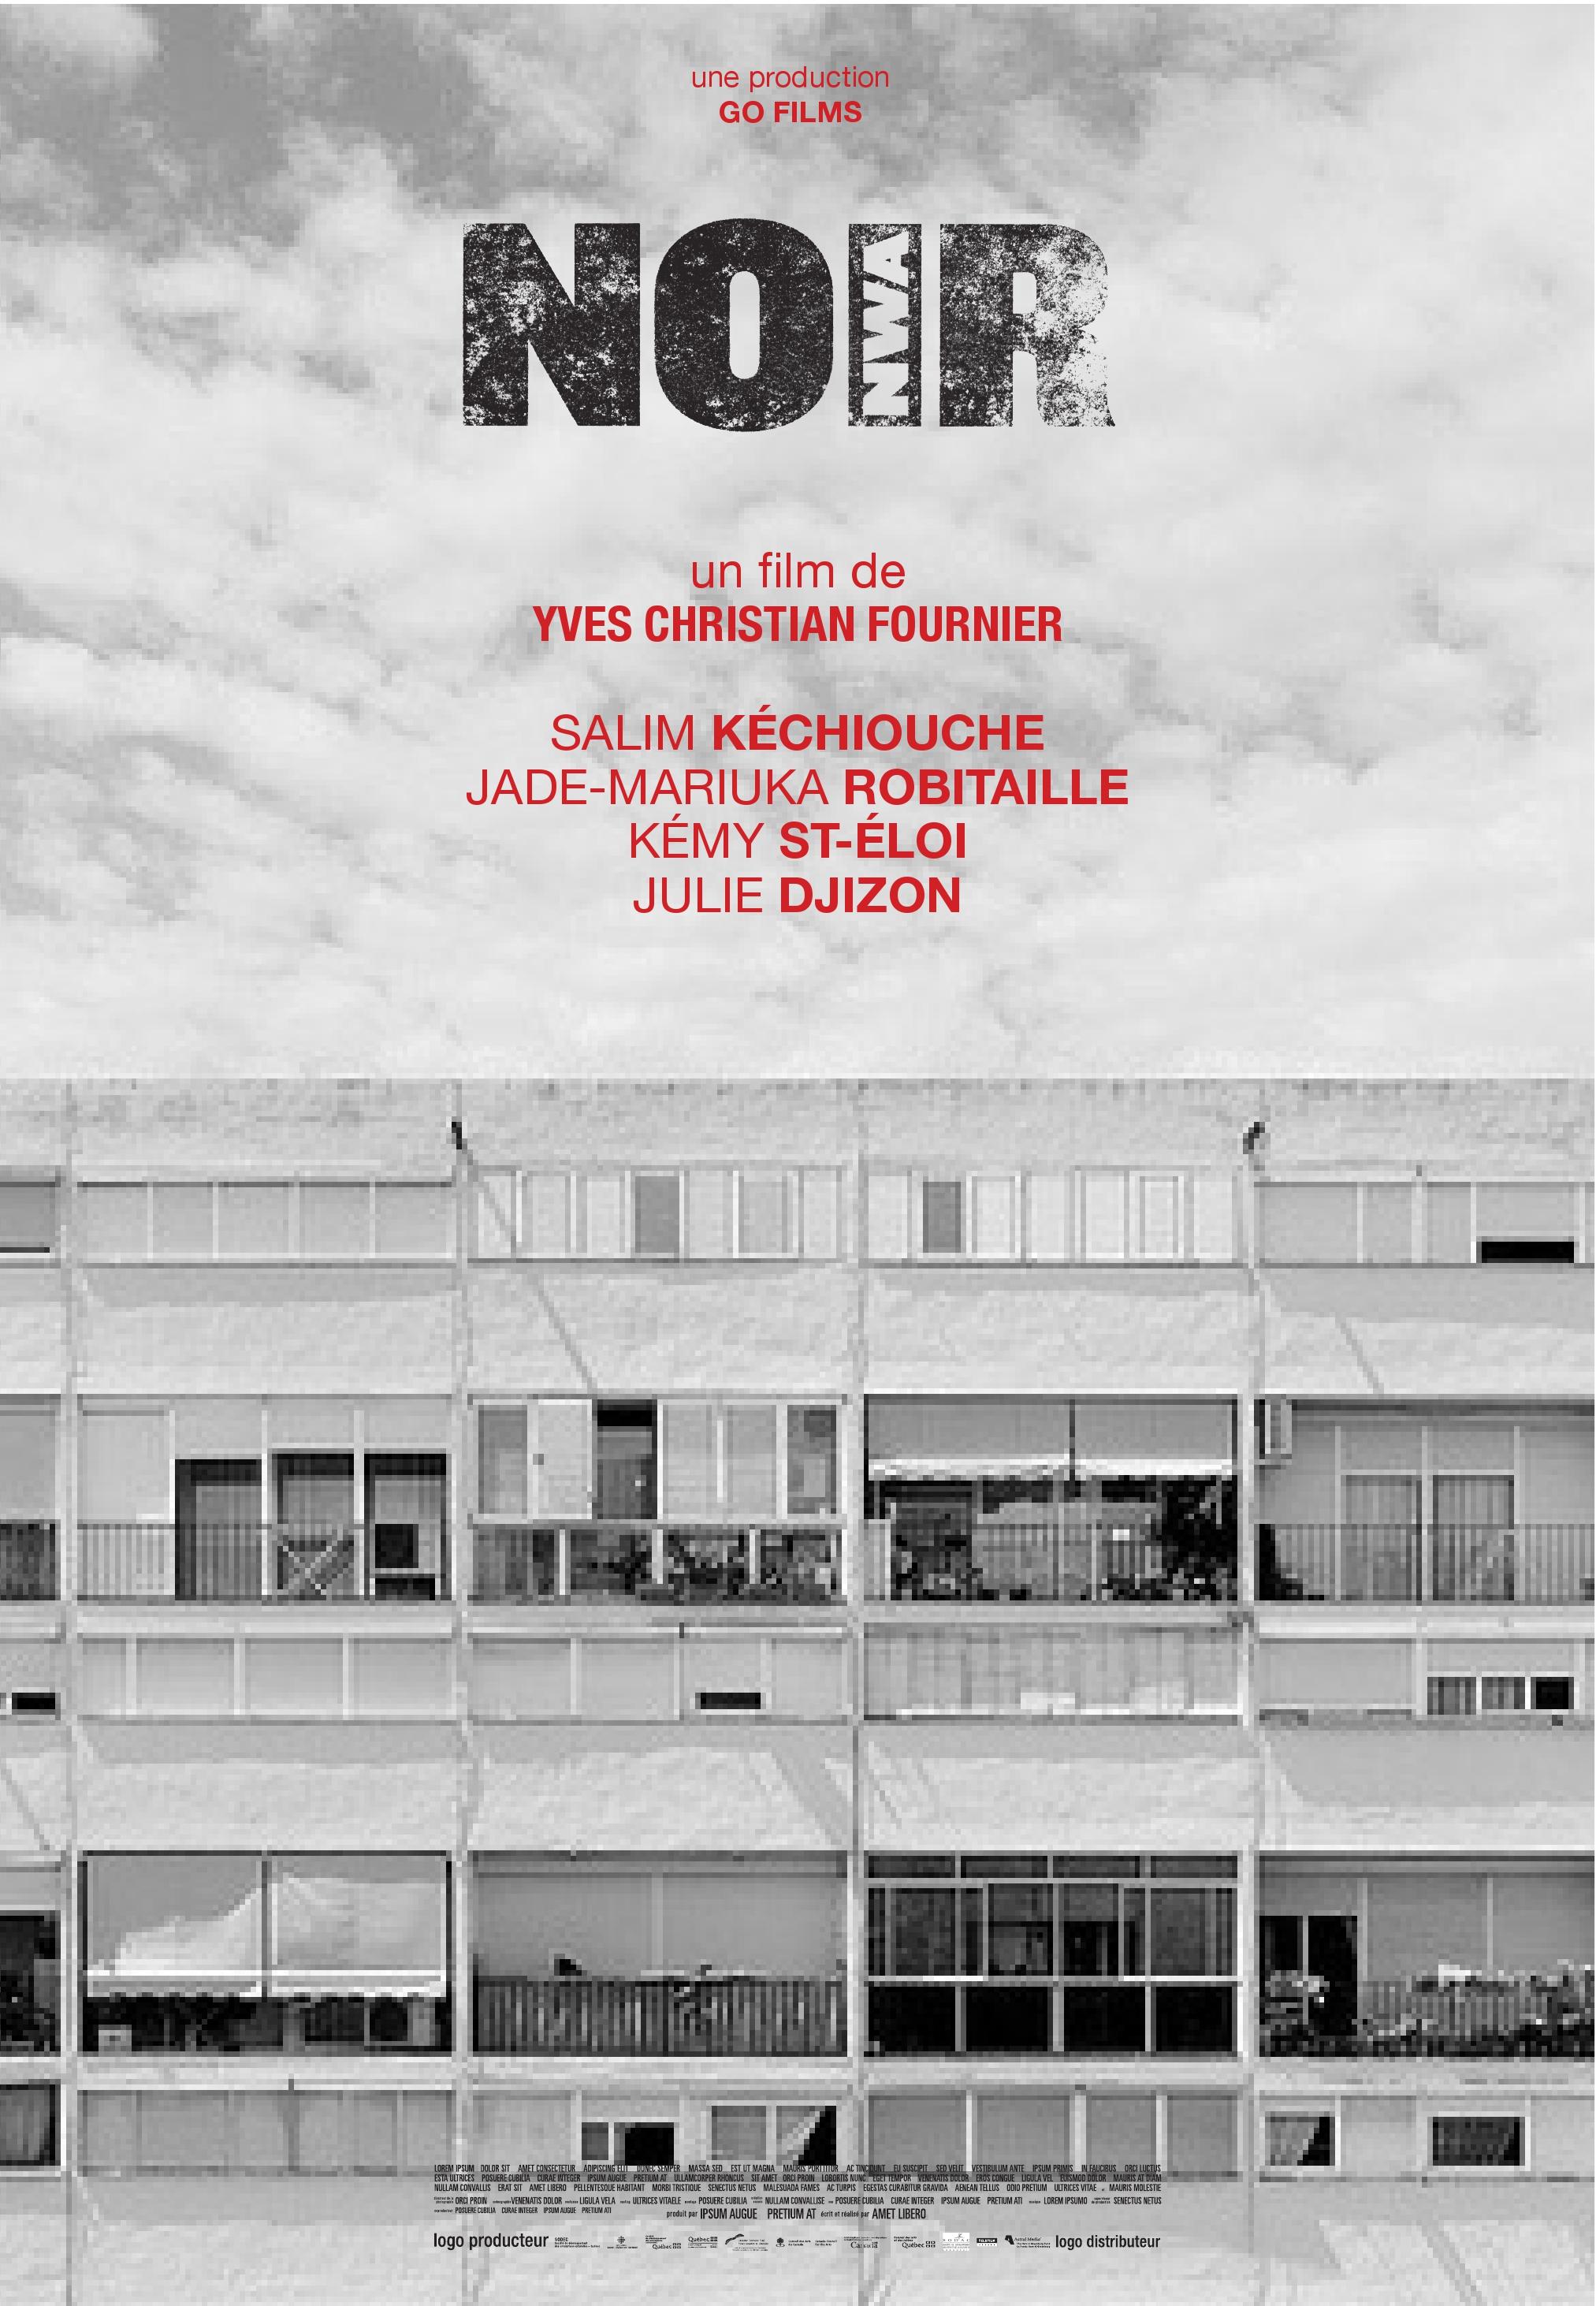 NOIR-Poster-RENZO-13oct-1_00028.jpg